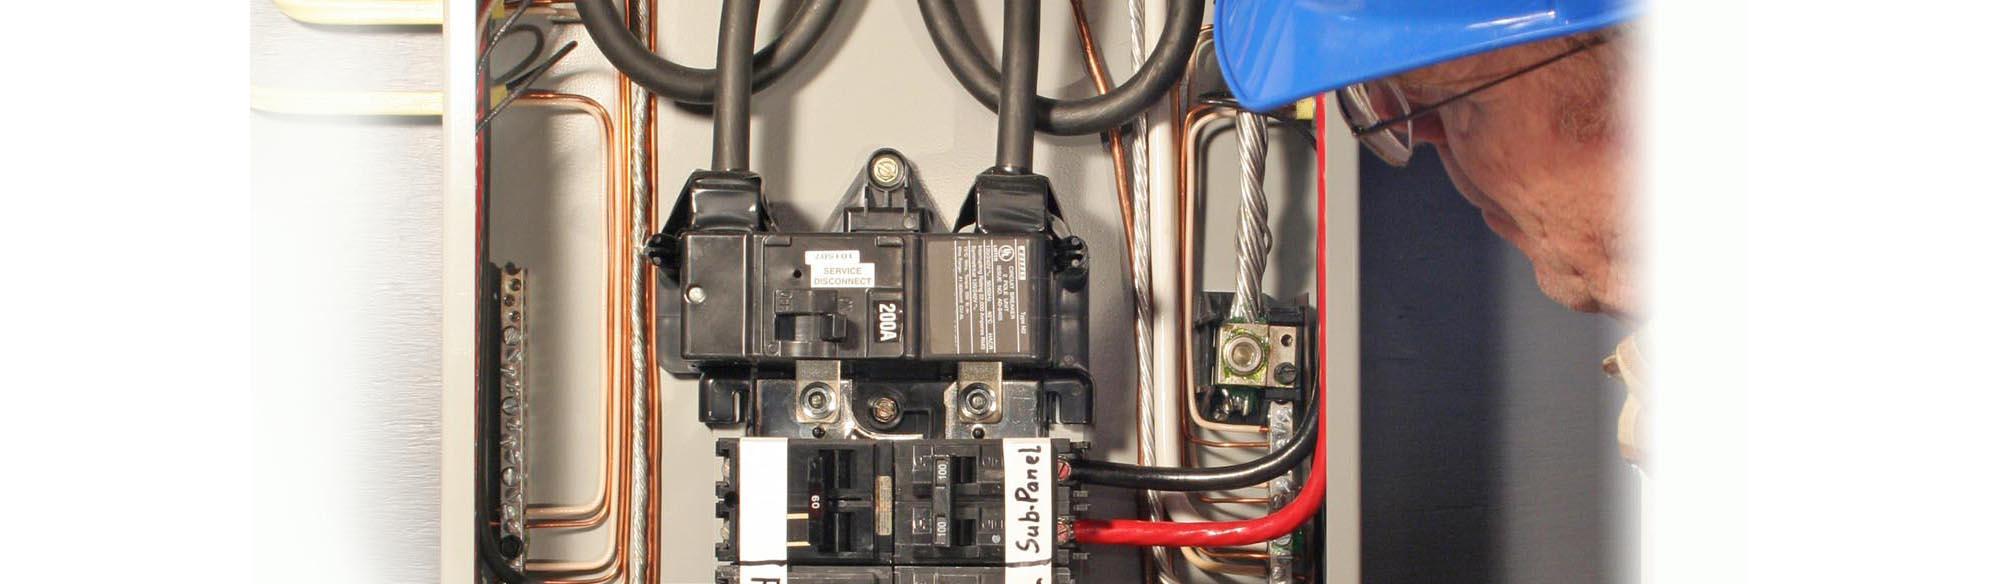 power-commercial   Armbrust Plumbing Inc